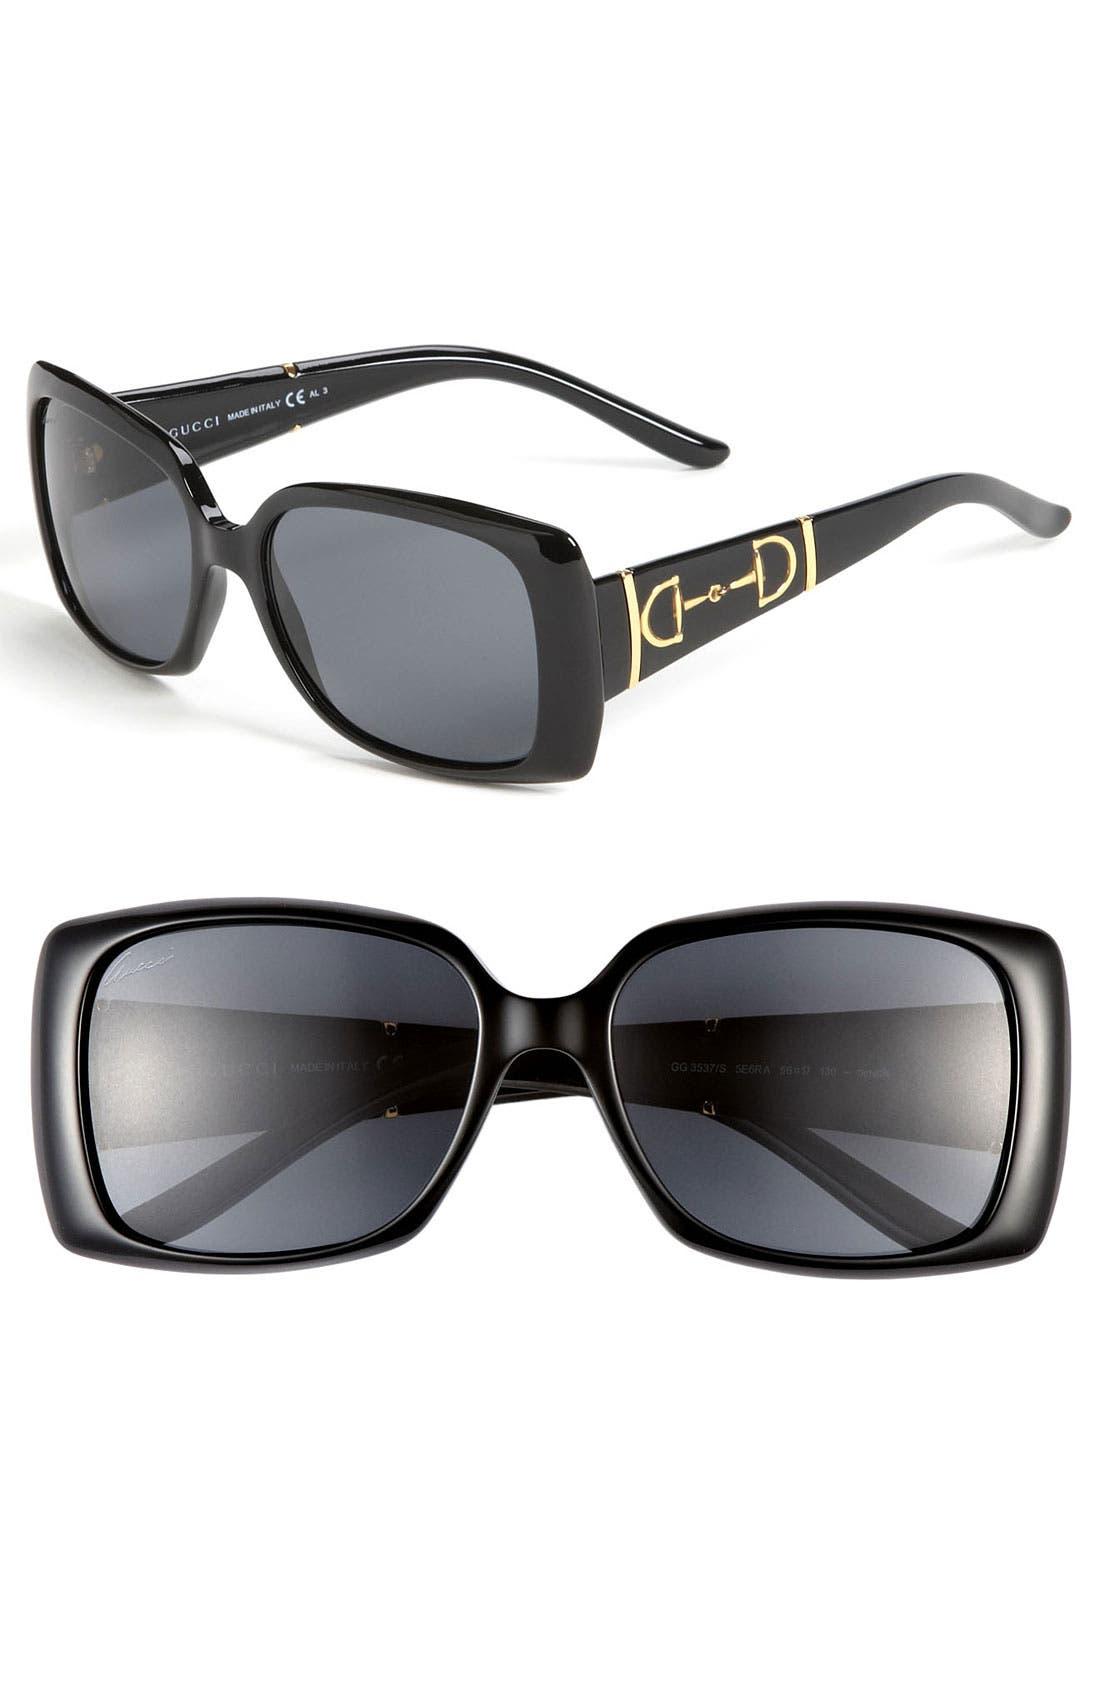 Alternate Image 1 Selected - Gucci Polarized Sunglasses